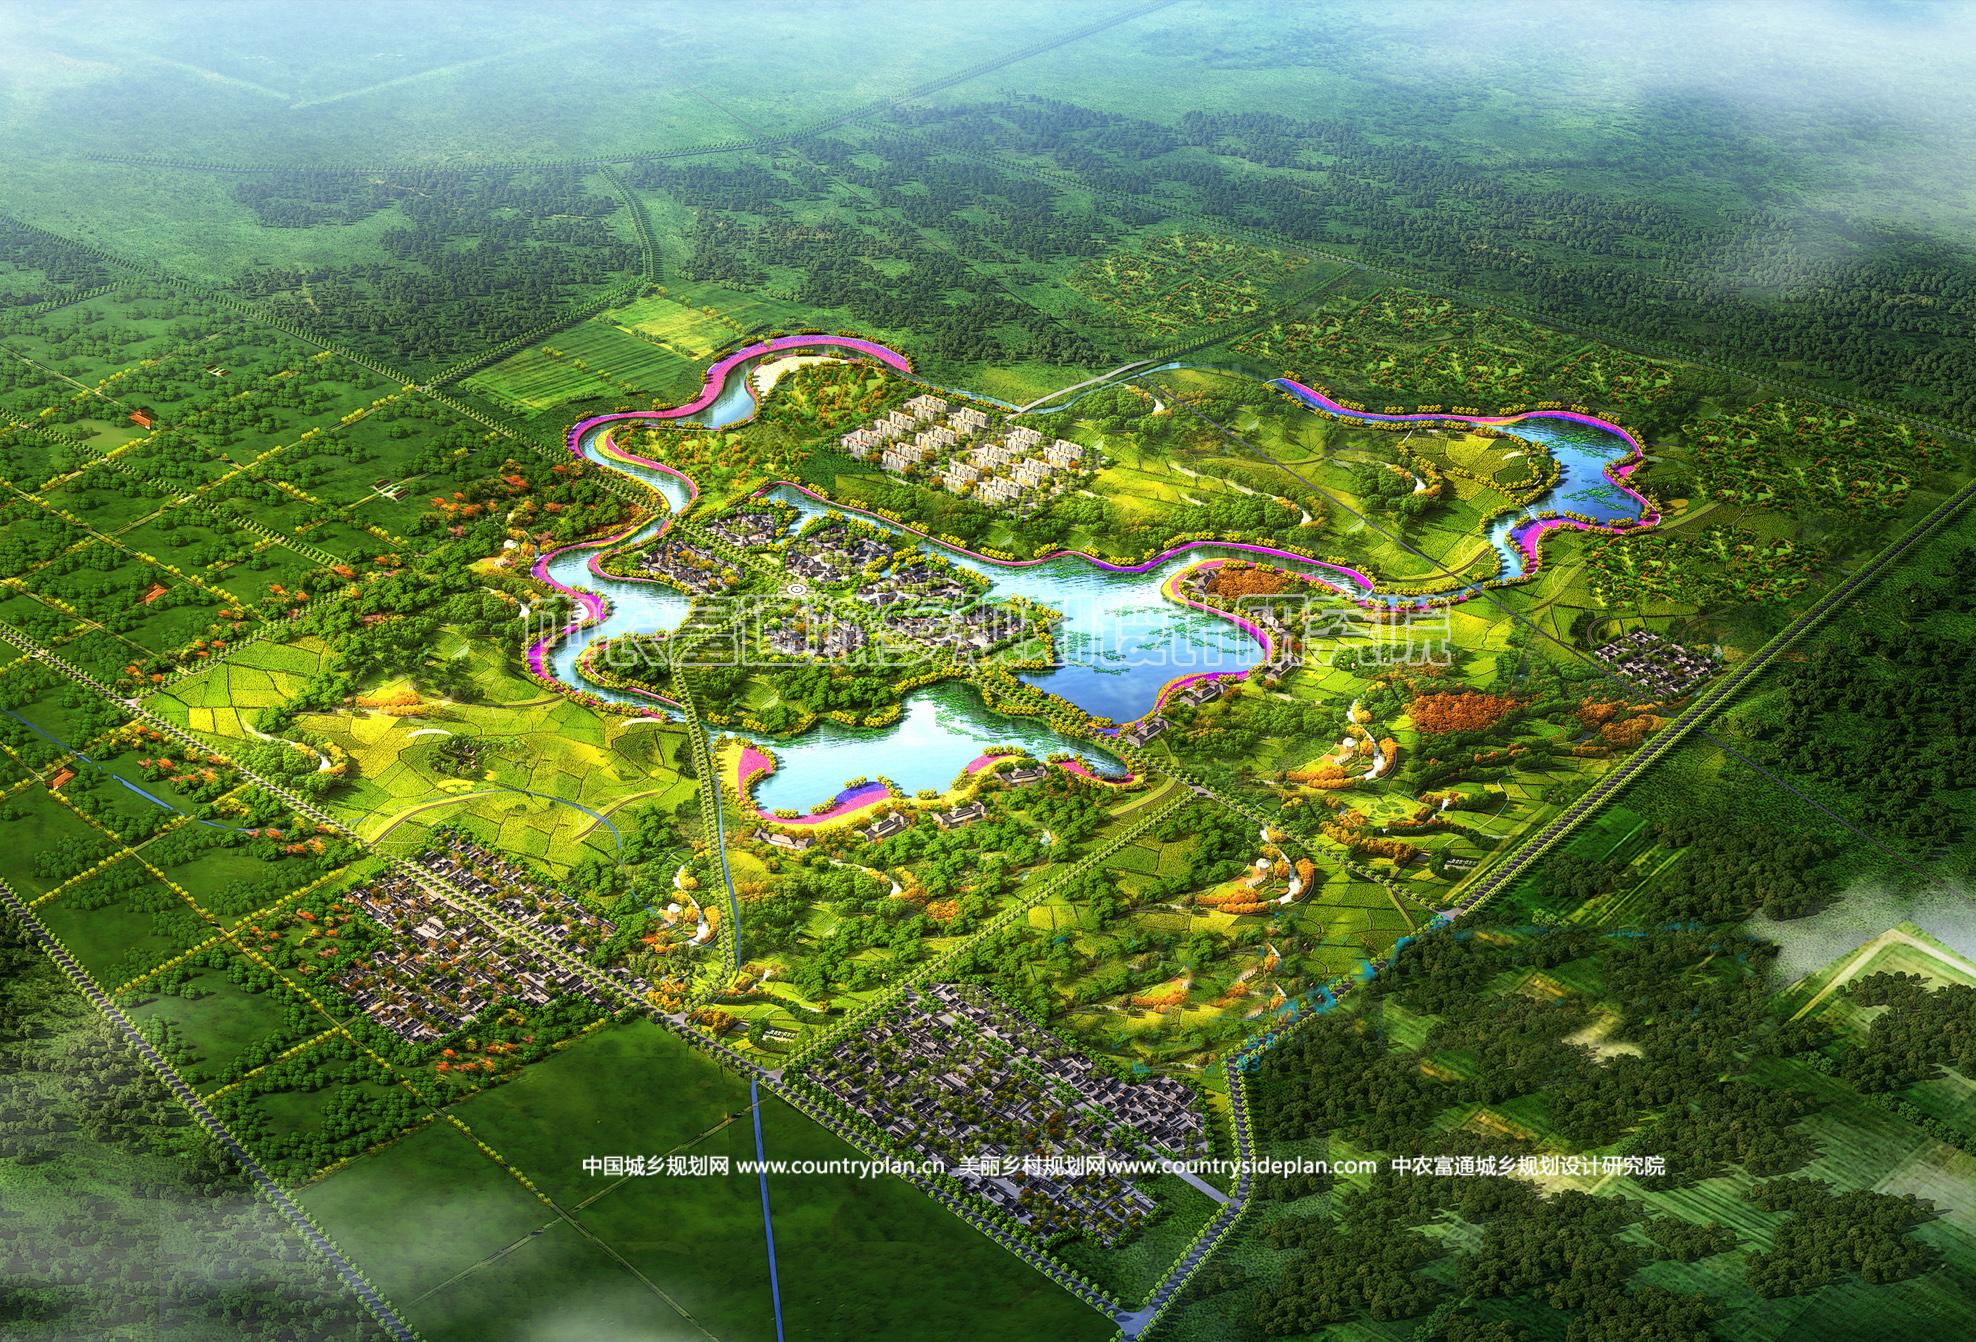 特色农业小镇,特色农业小镇发展规划